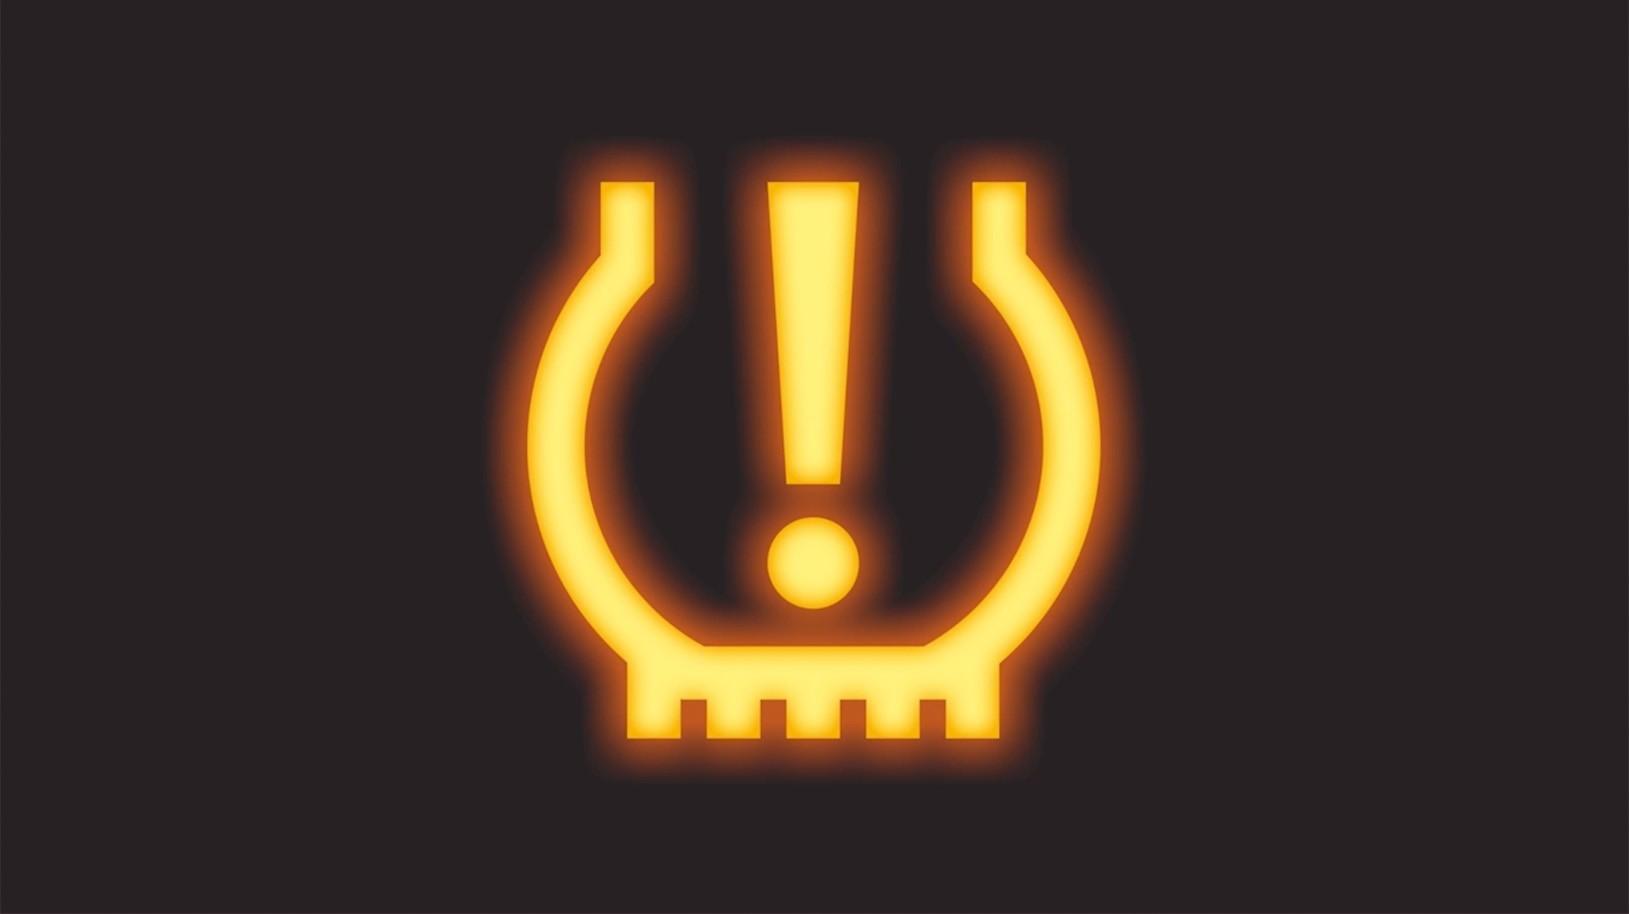 Tire Pressure Monitoring System warning light